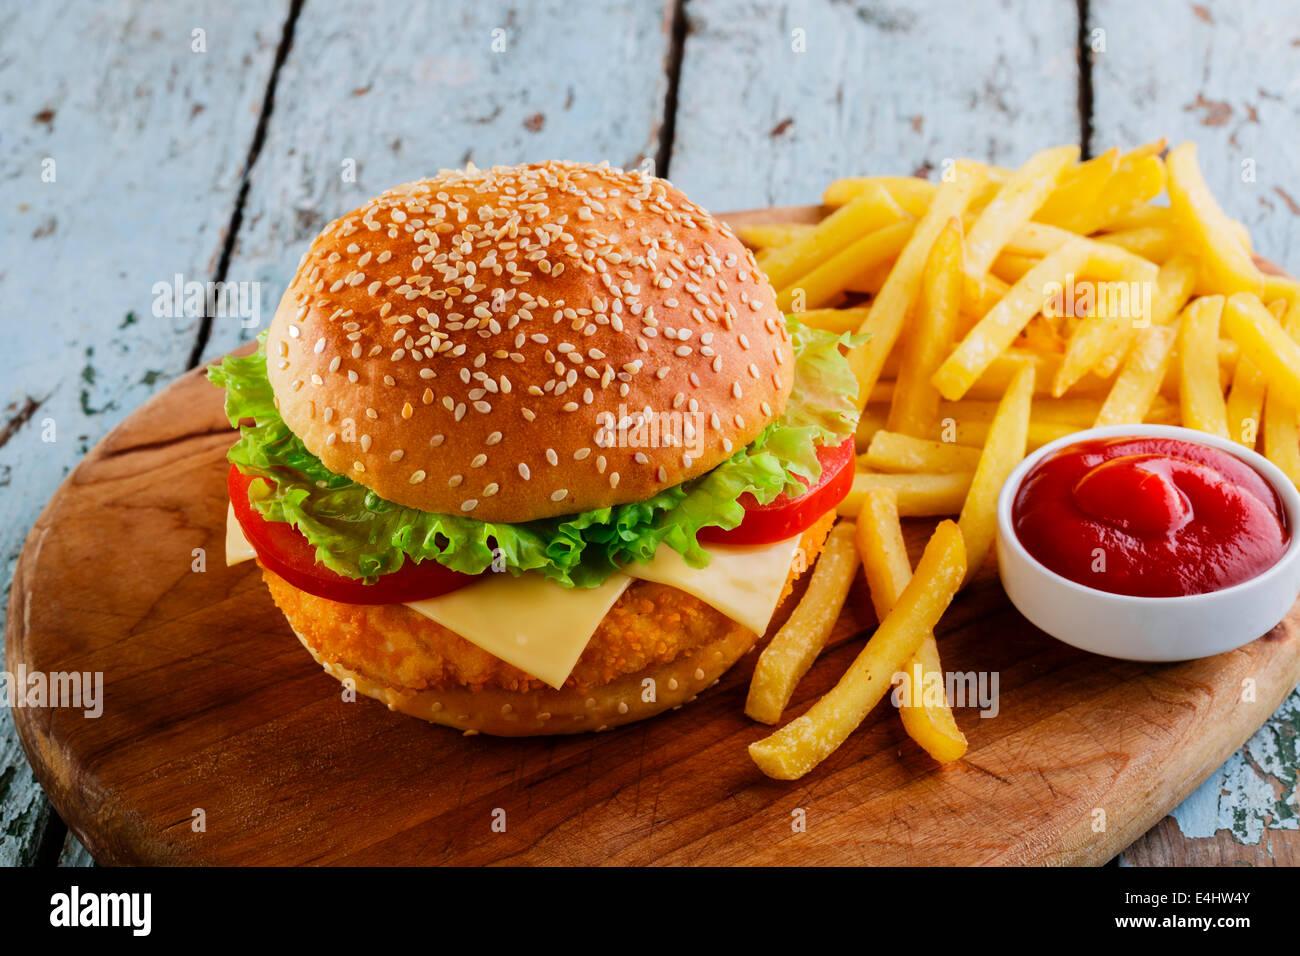 slamme eating fast food - 1024×750